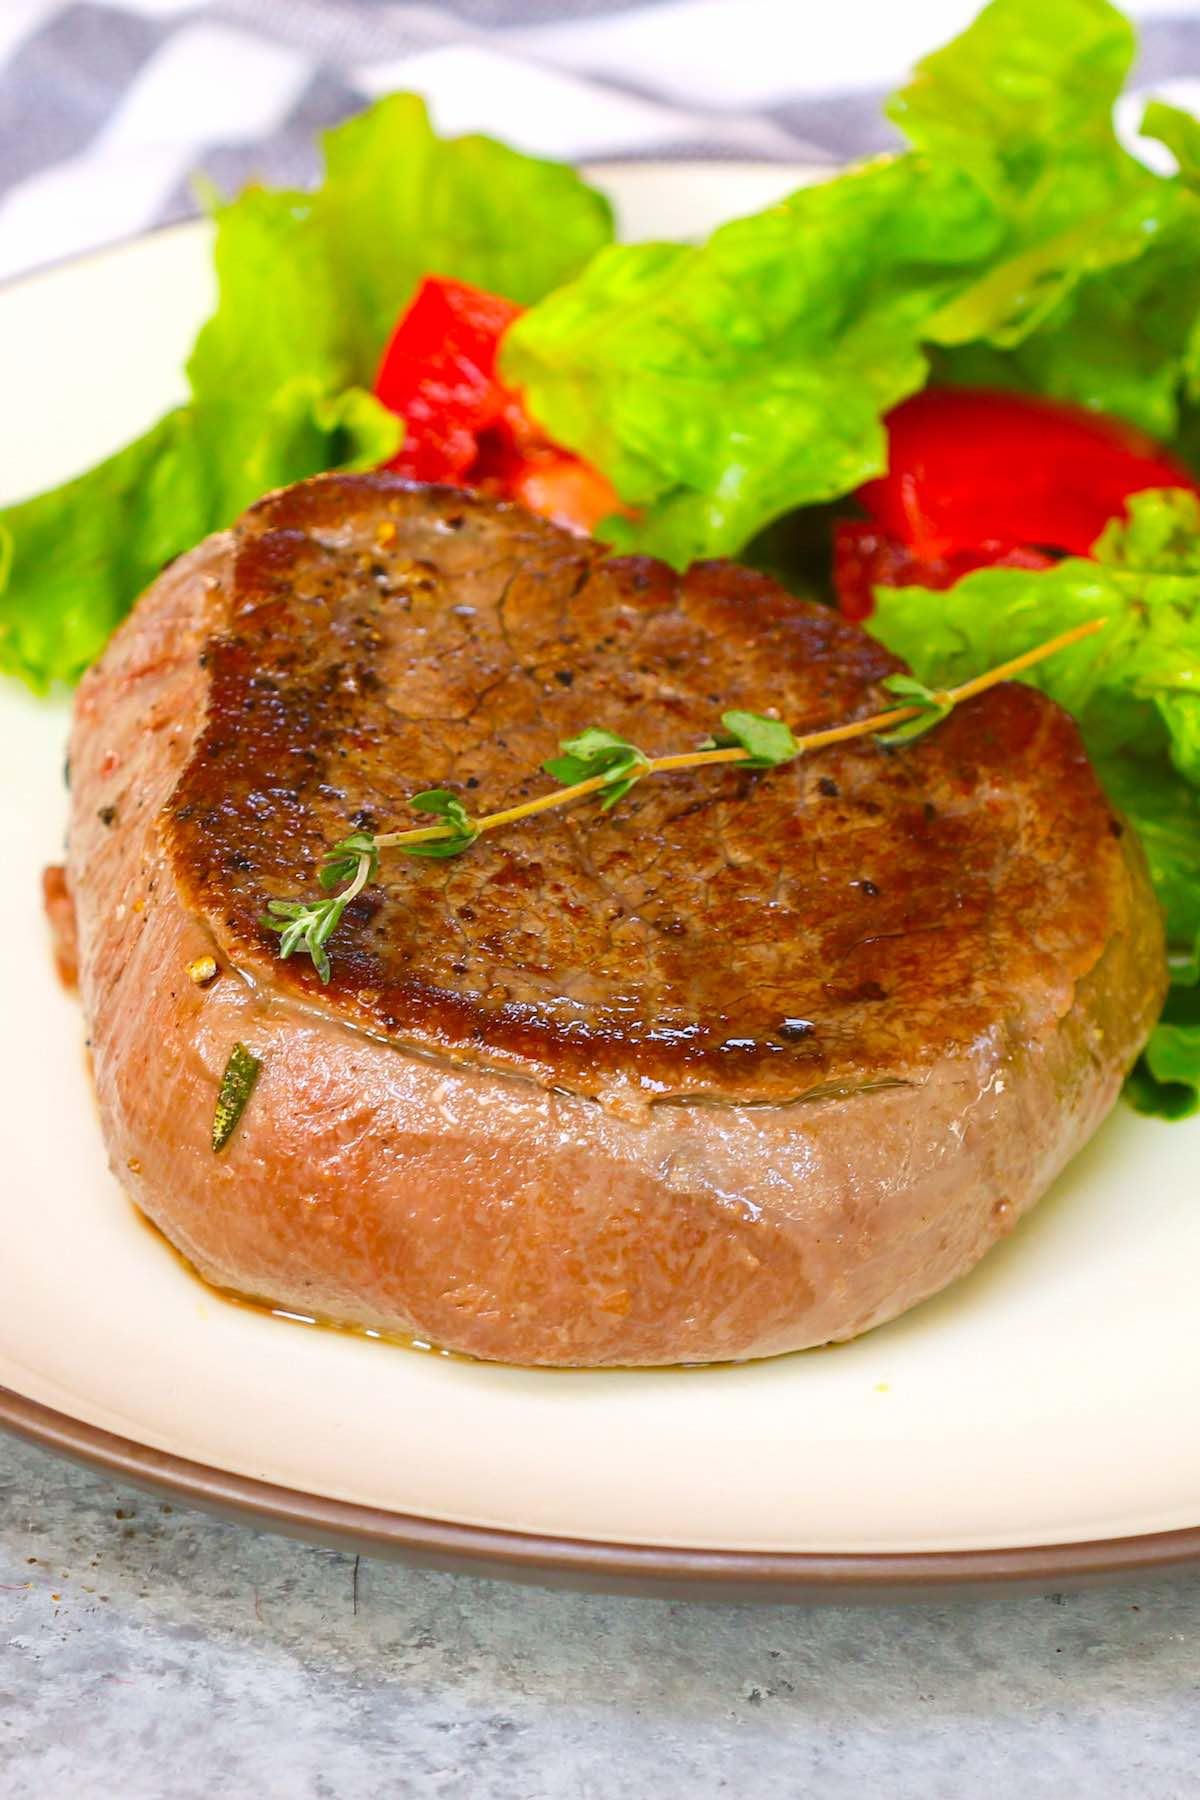 Tenderloin steak served with a side salad